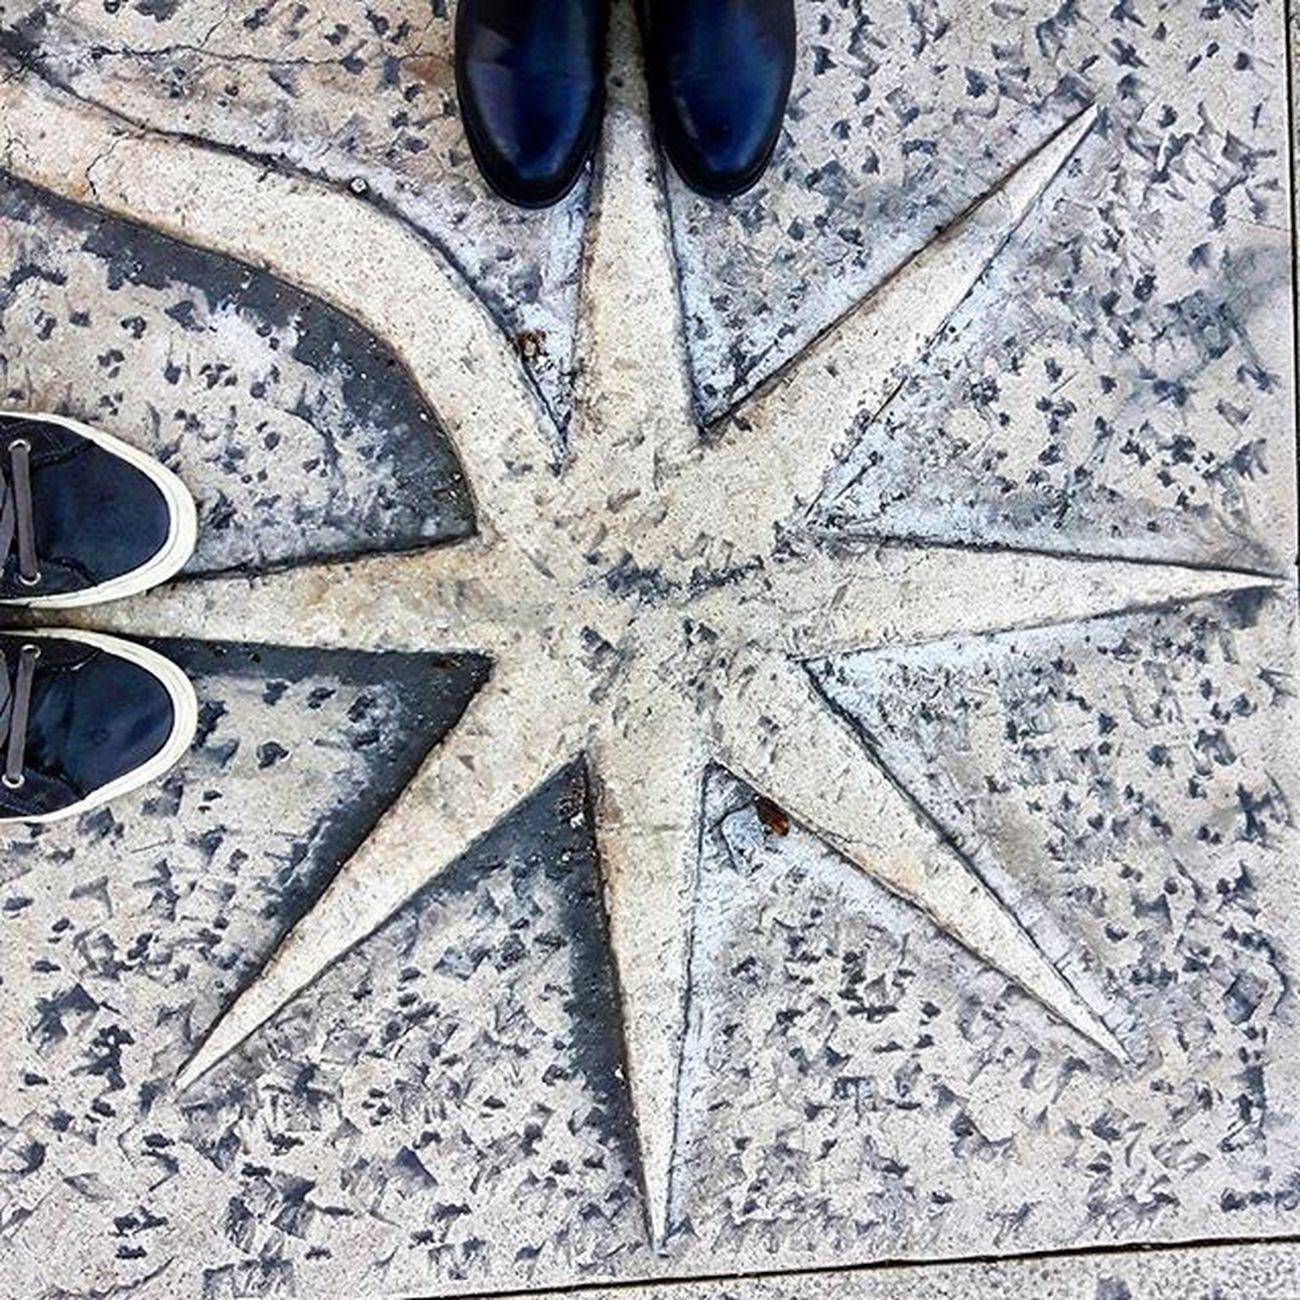 Feet & Star Myvallo Igers_salerno Igerscampania Igeritalia Dafareasalerno Dafareincampania Insolitaitalia Campaniafelix Fromwhereistand Ihavethisthingwithfloors Teggiano